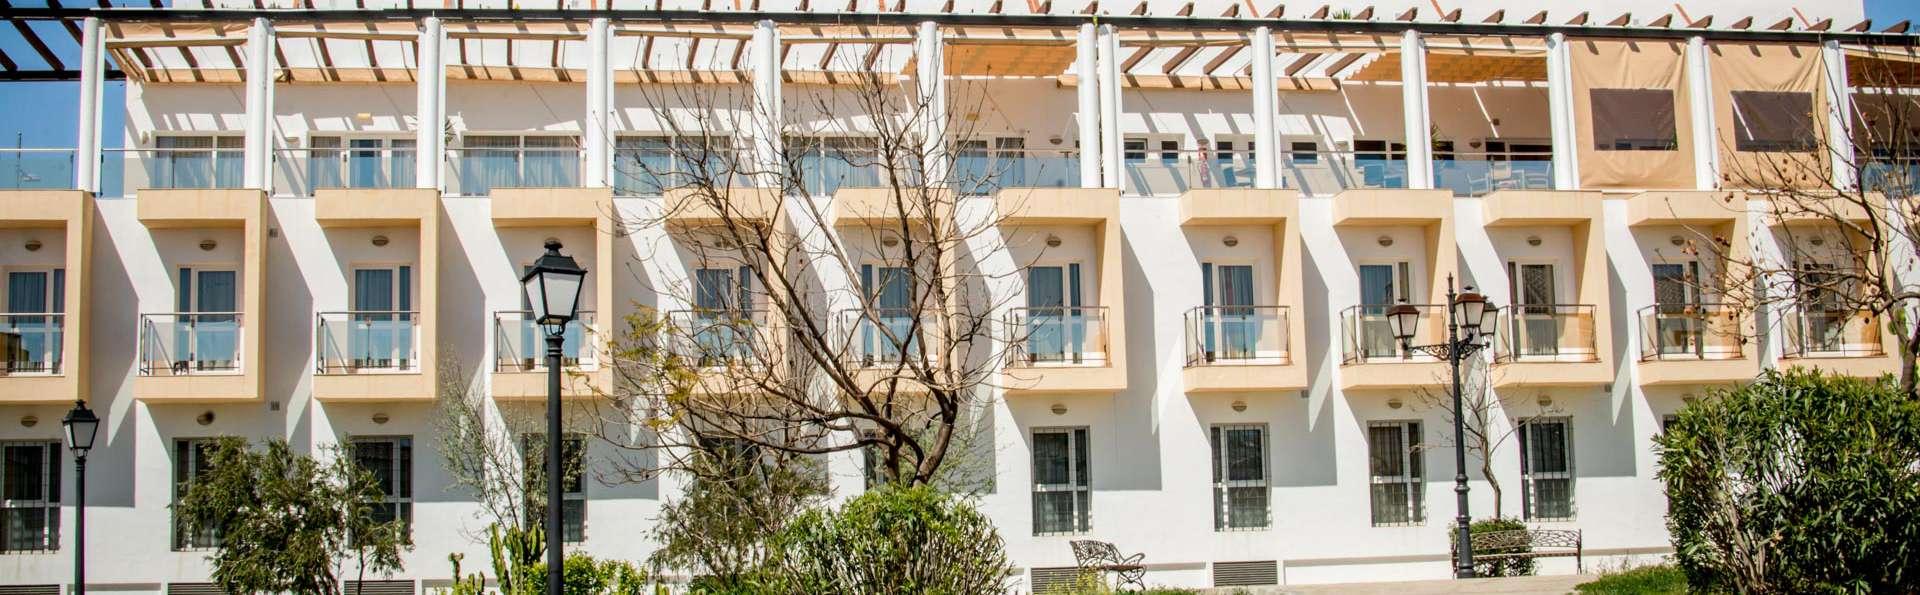 Ele Hotel Spa Medina Sidonia - EDIT_FRONT_01.jpg